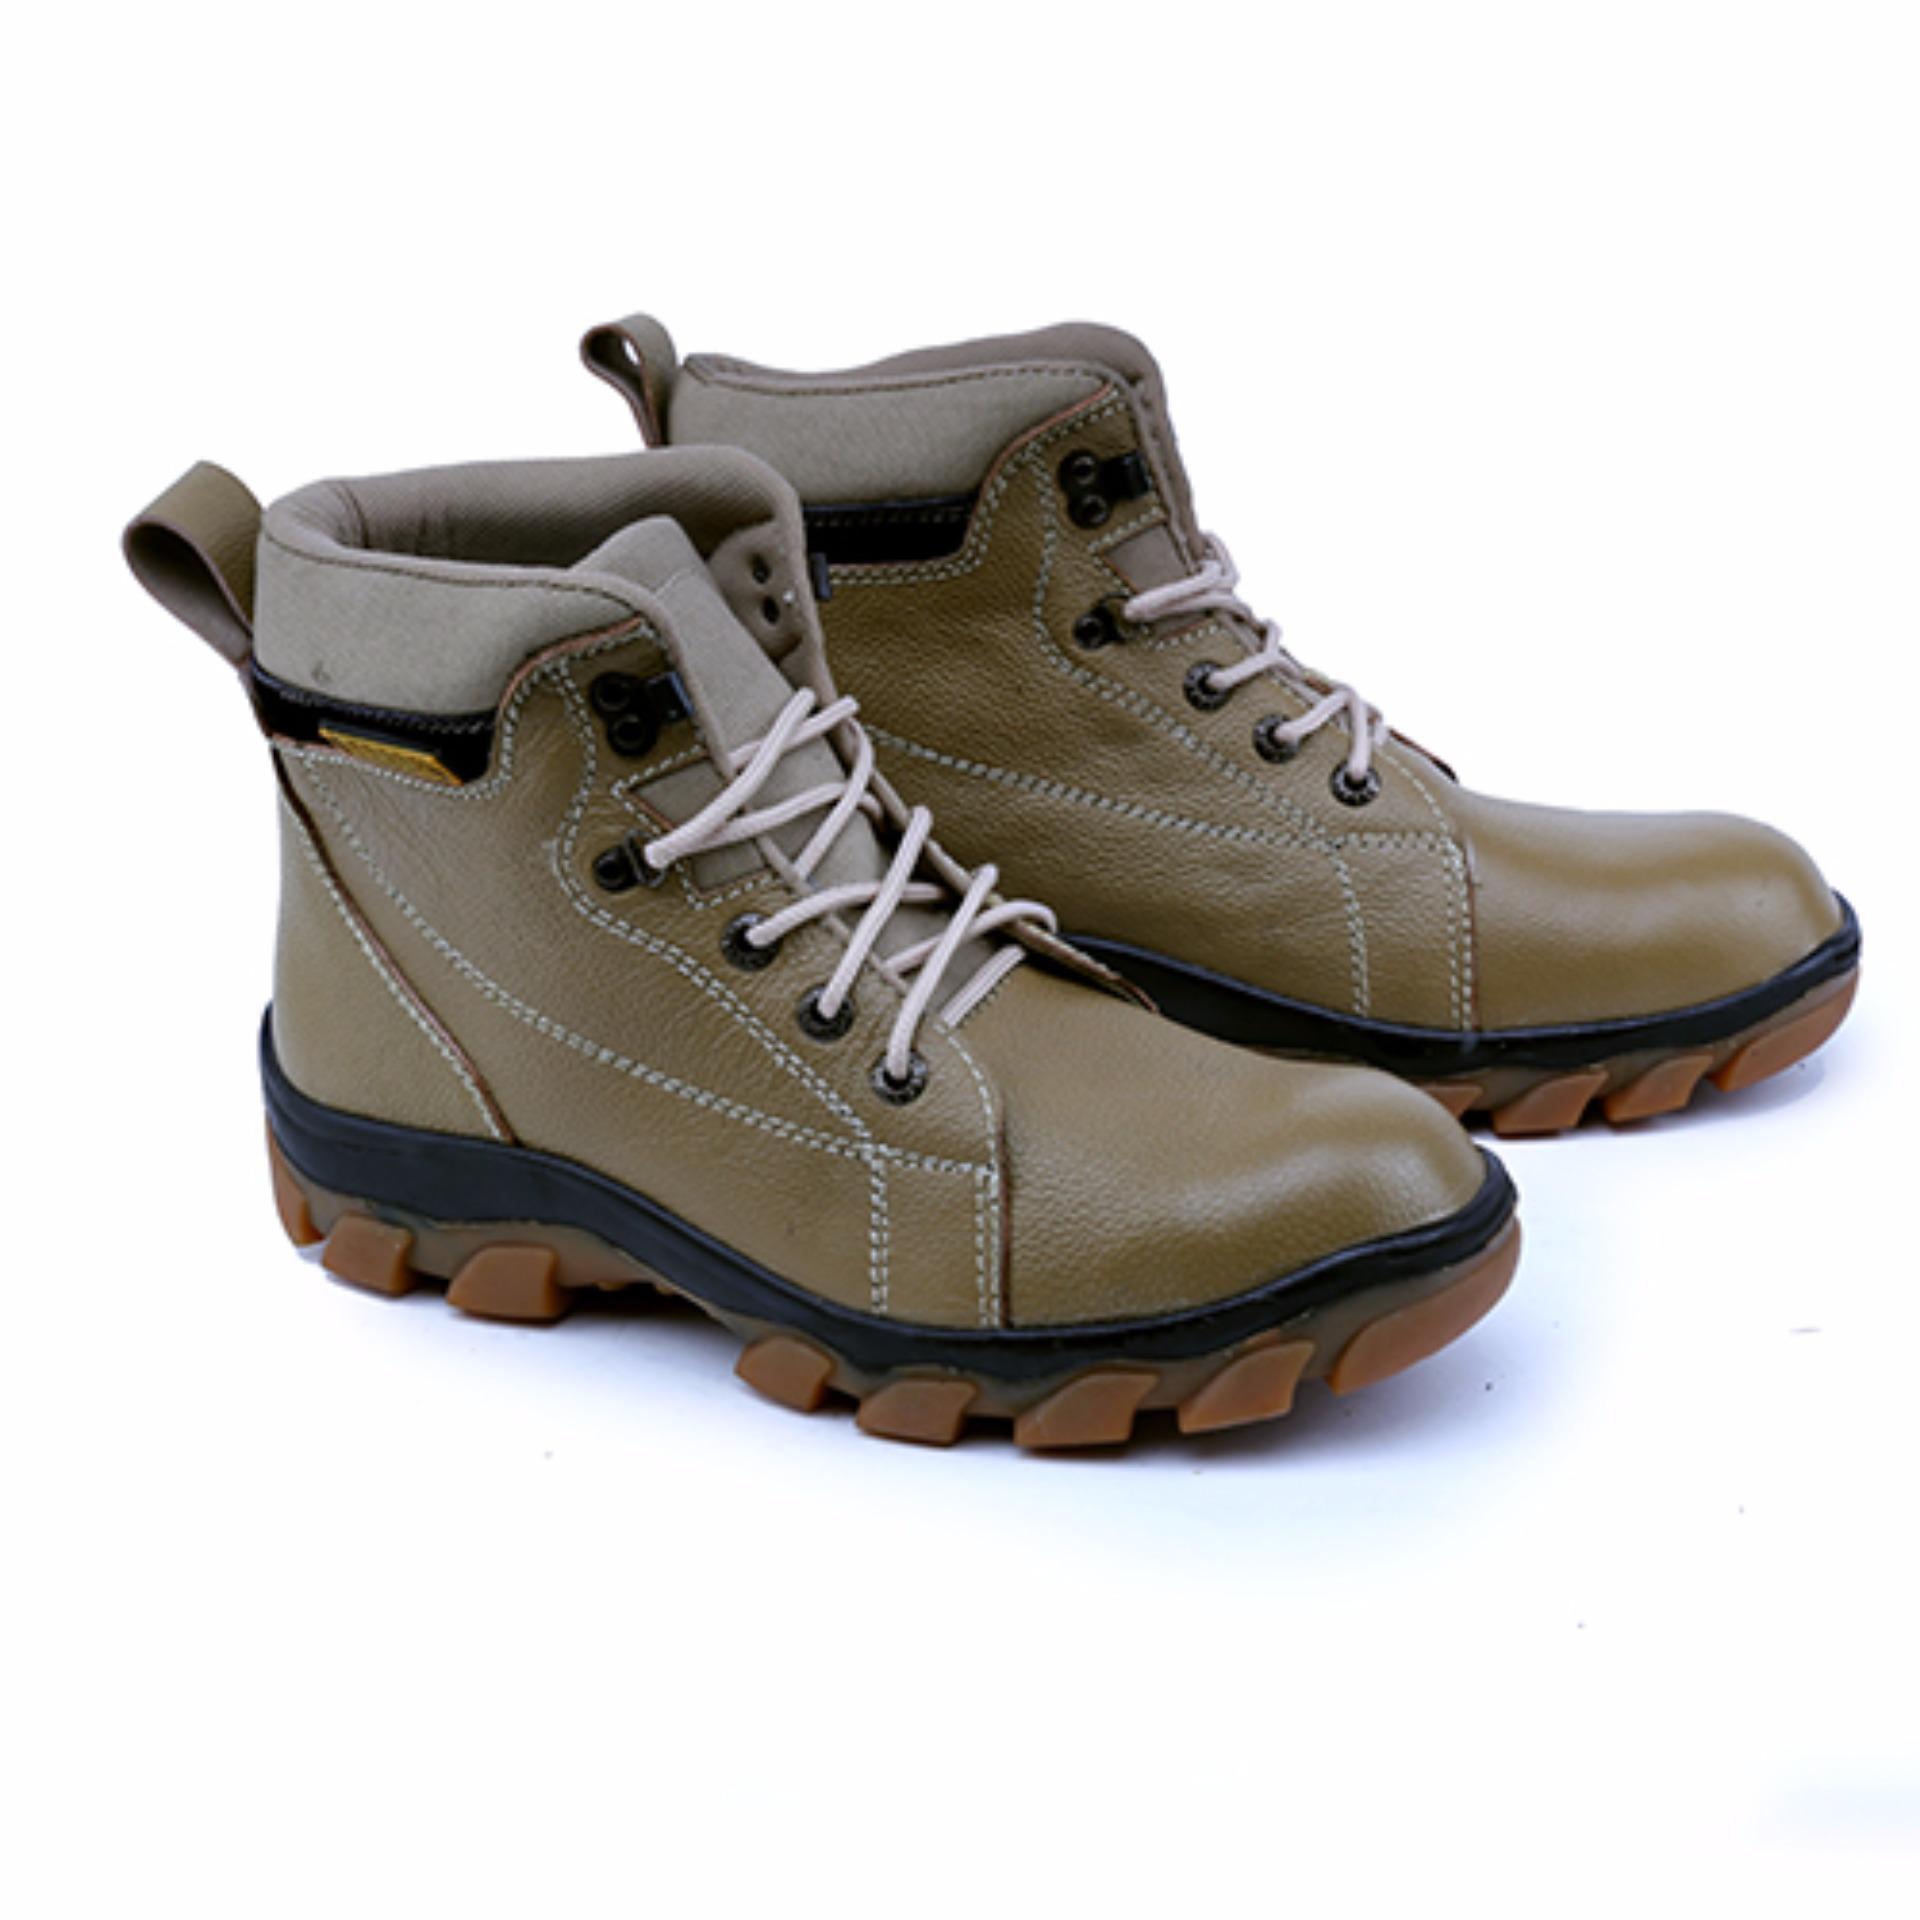 garsel-sepatu-boots-amp-safety-safety-shoes-pria-grn-2505-bahanpremium-leather-1195-94443793-c884e4b7de7f8d5bea7a5f0336243054 10 Daftar Harga Sepatu Safety Garsel Paling Baru 2018